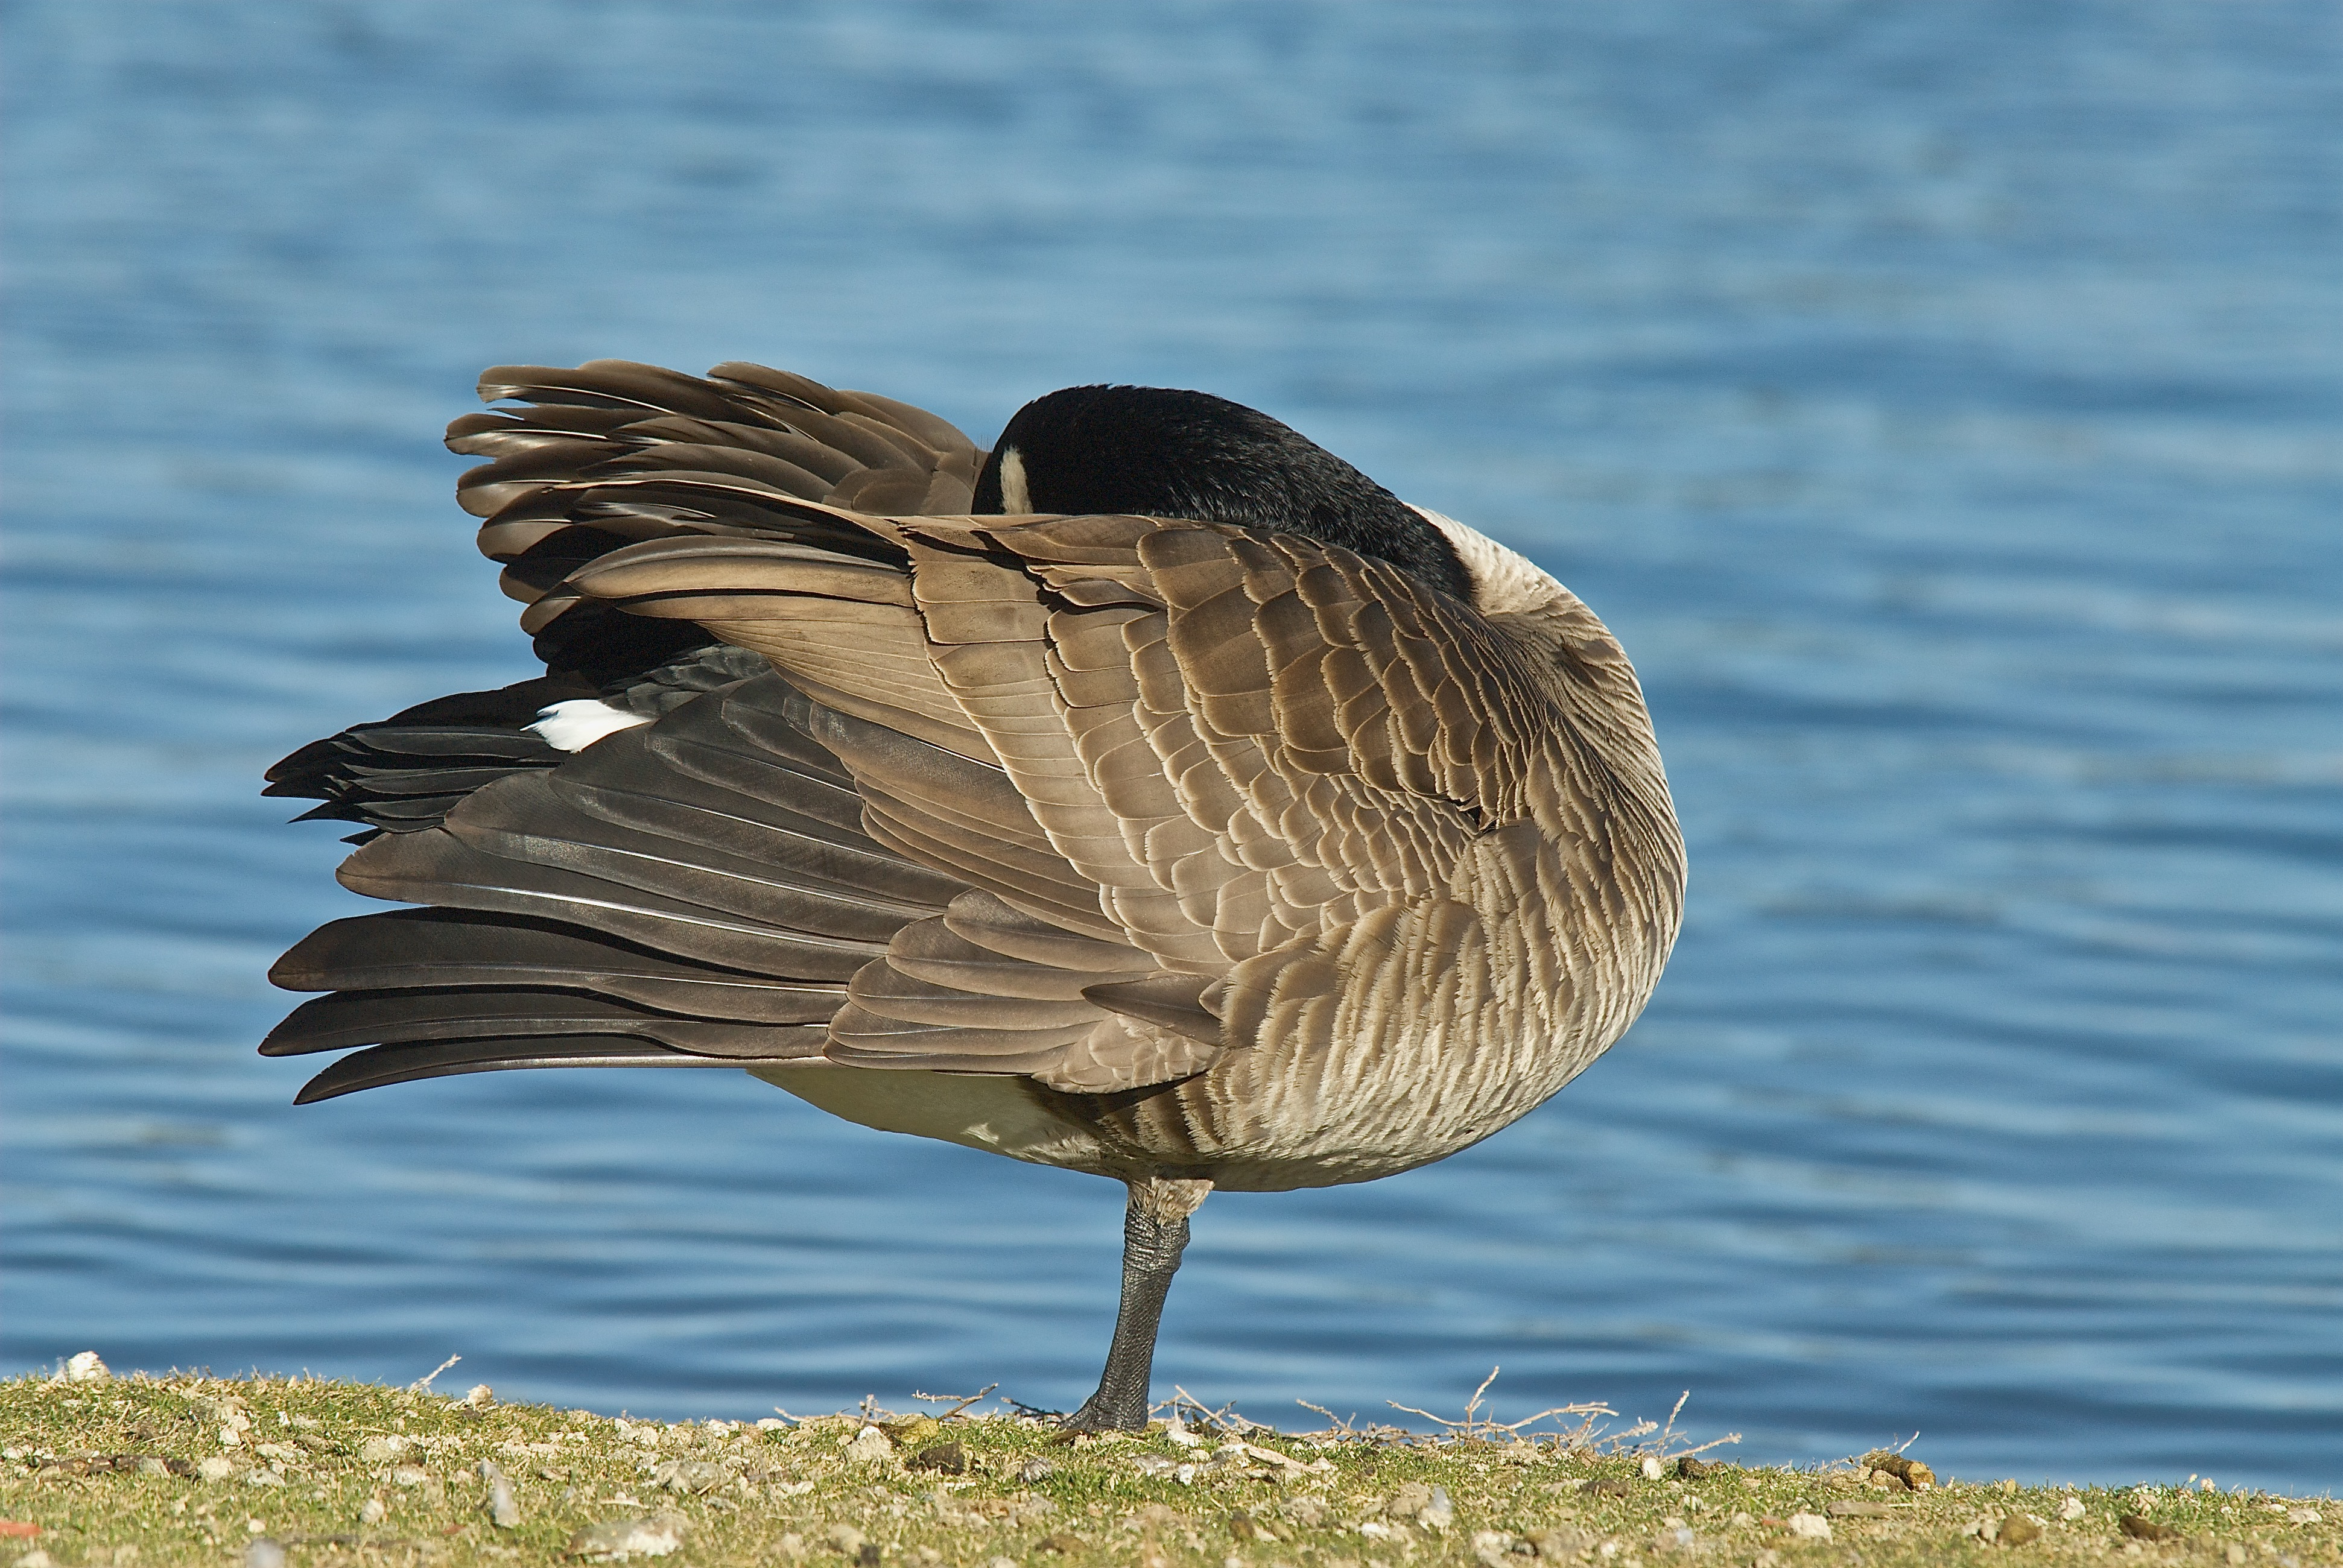 Preening Canada Goose